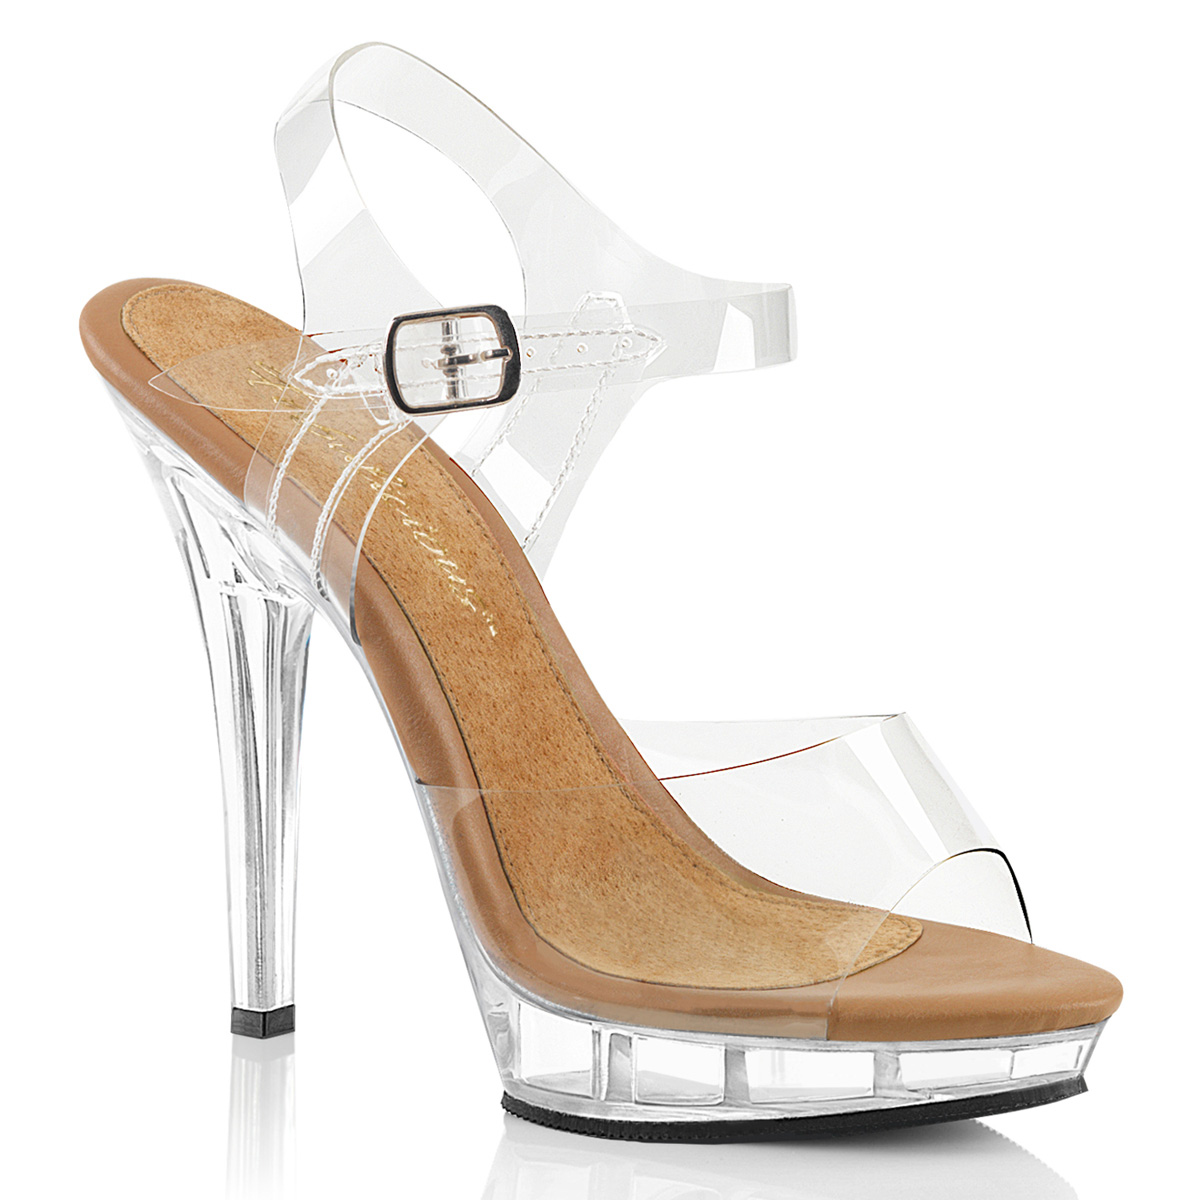 Sandalette LIP LIP Sandalette 108 Klar Tan, Fabulicious fc5065